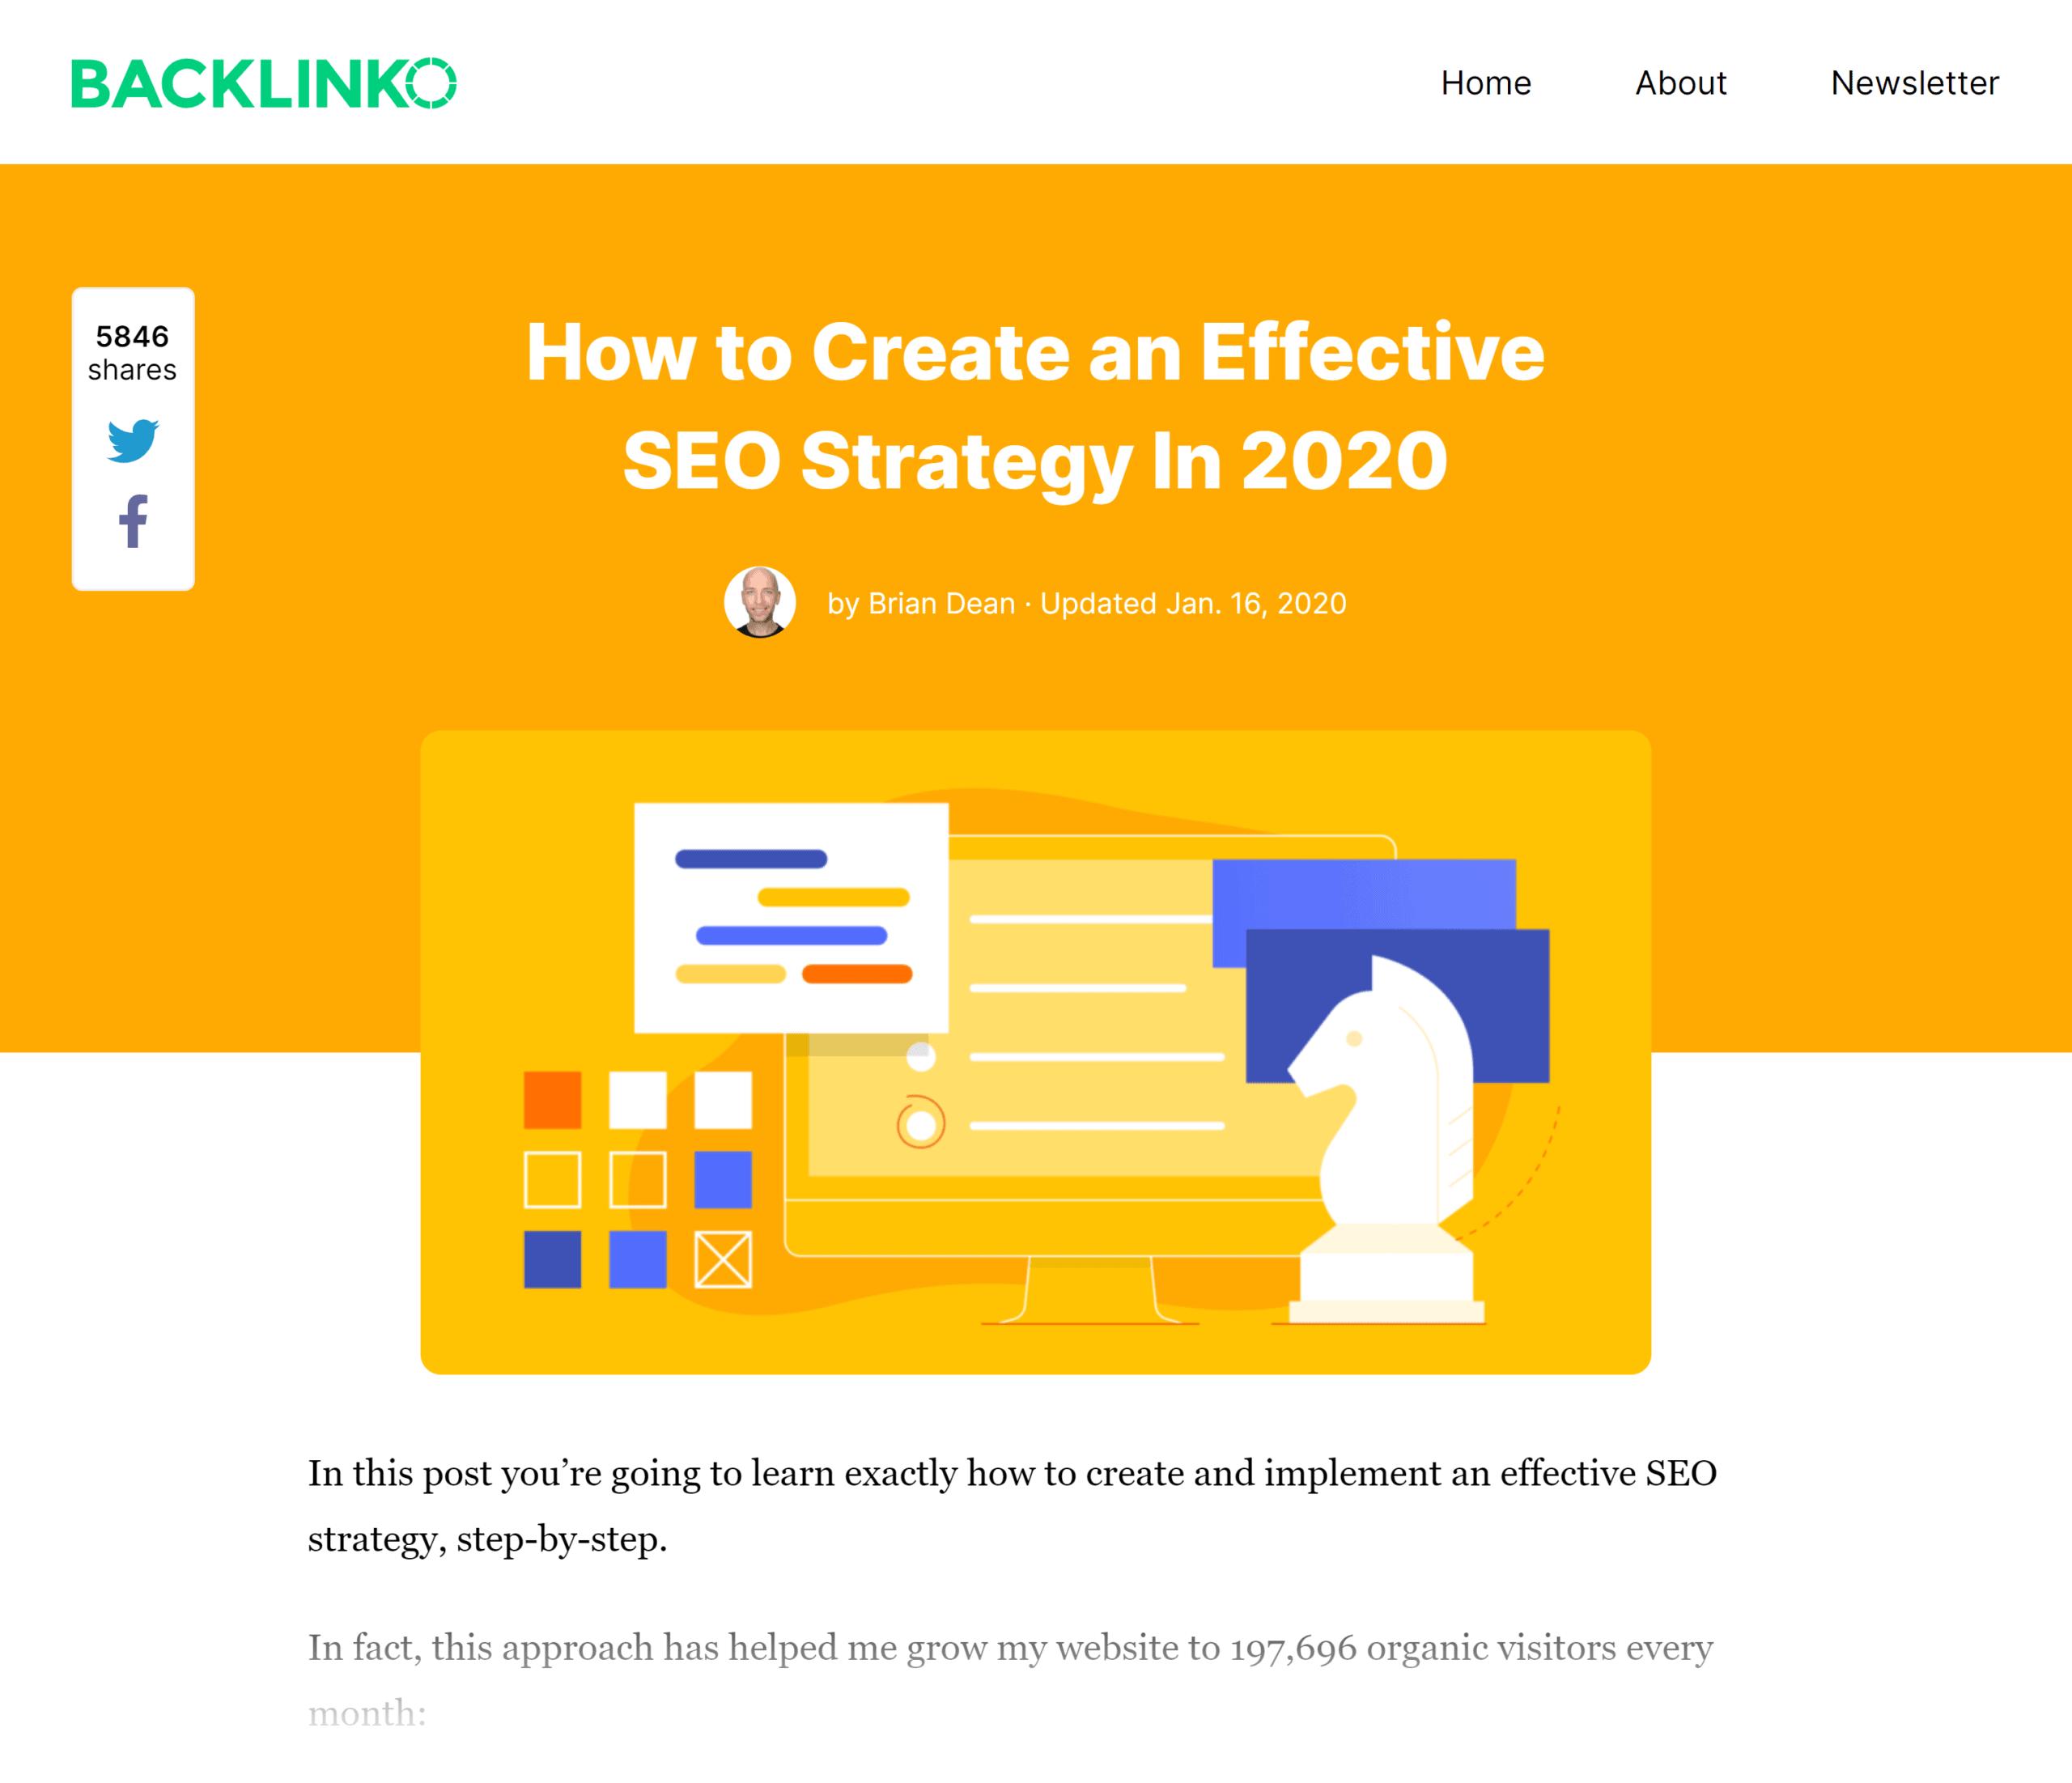 Backlinko – SEO Strategy post